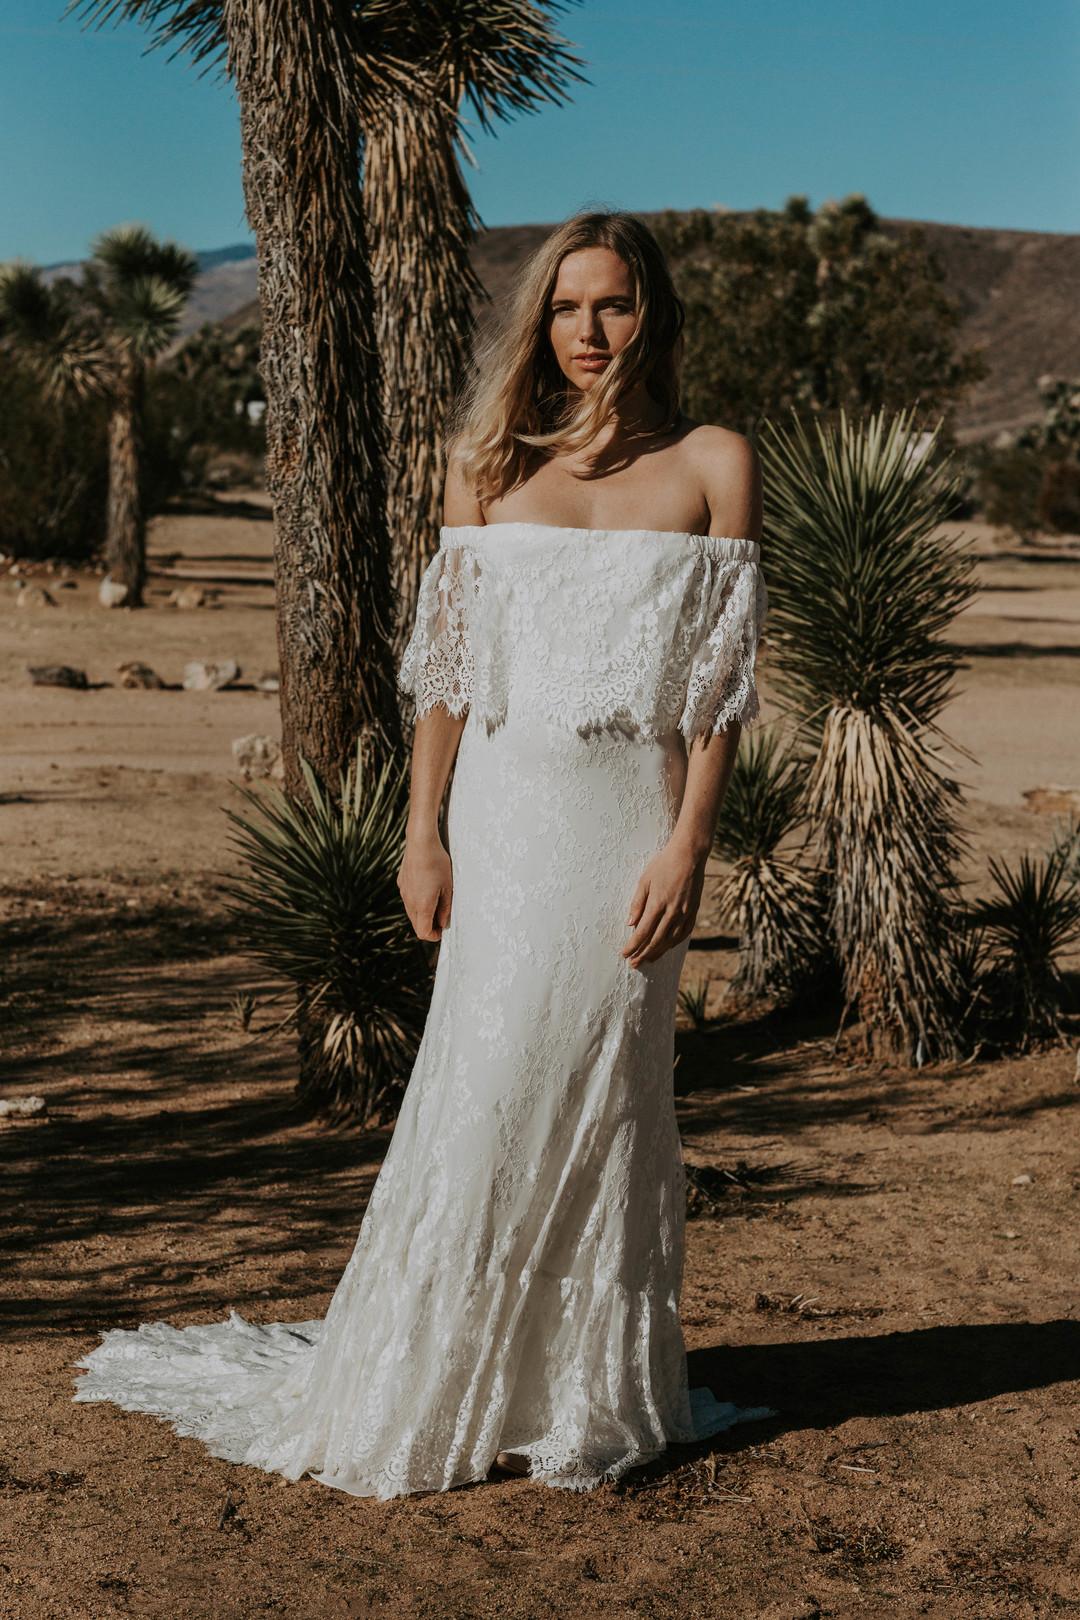 laurence dress photo